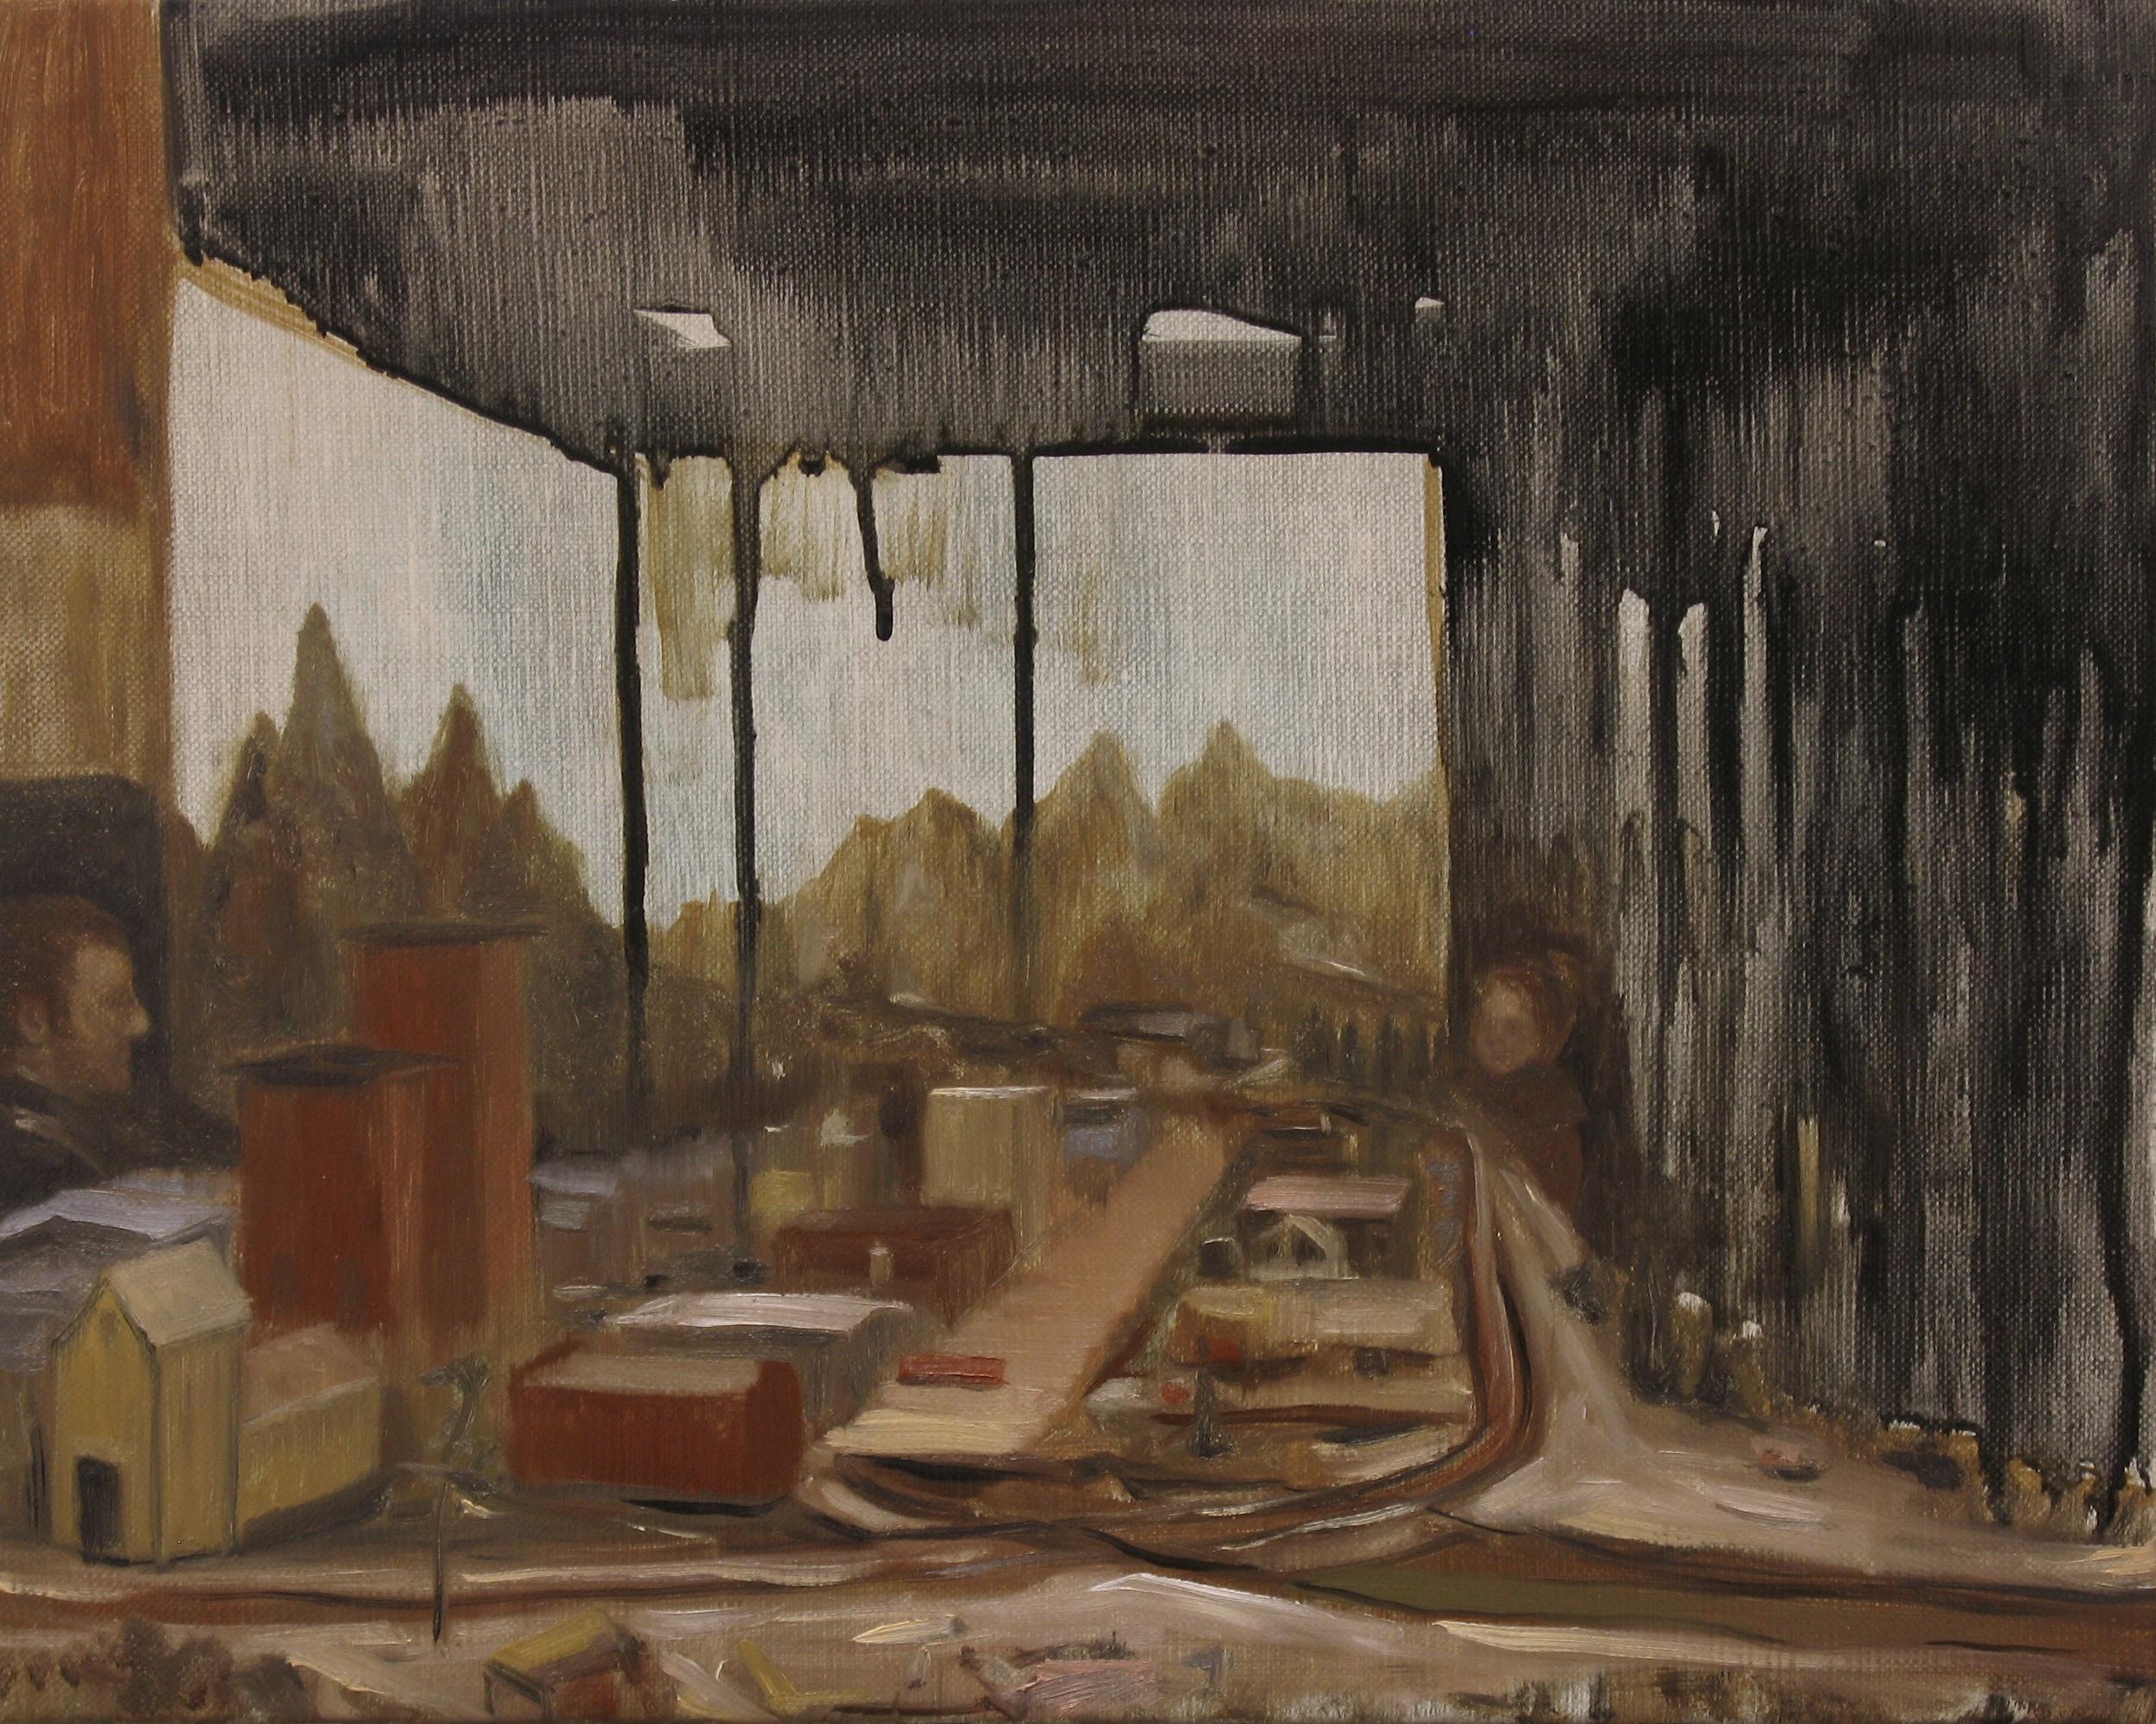 Dreamland, Oil on linen, 24 x 30cm, 2013